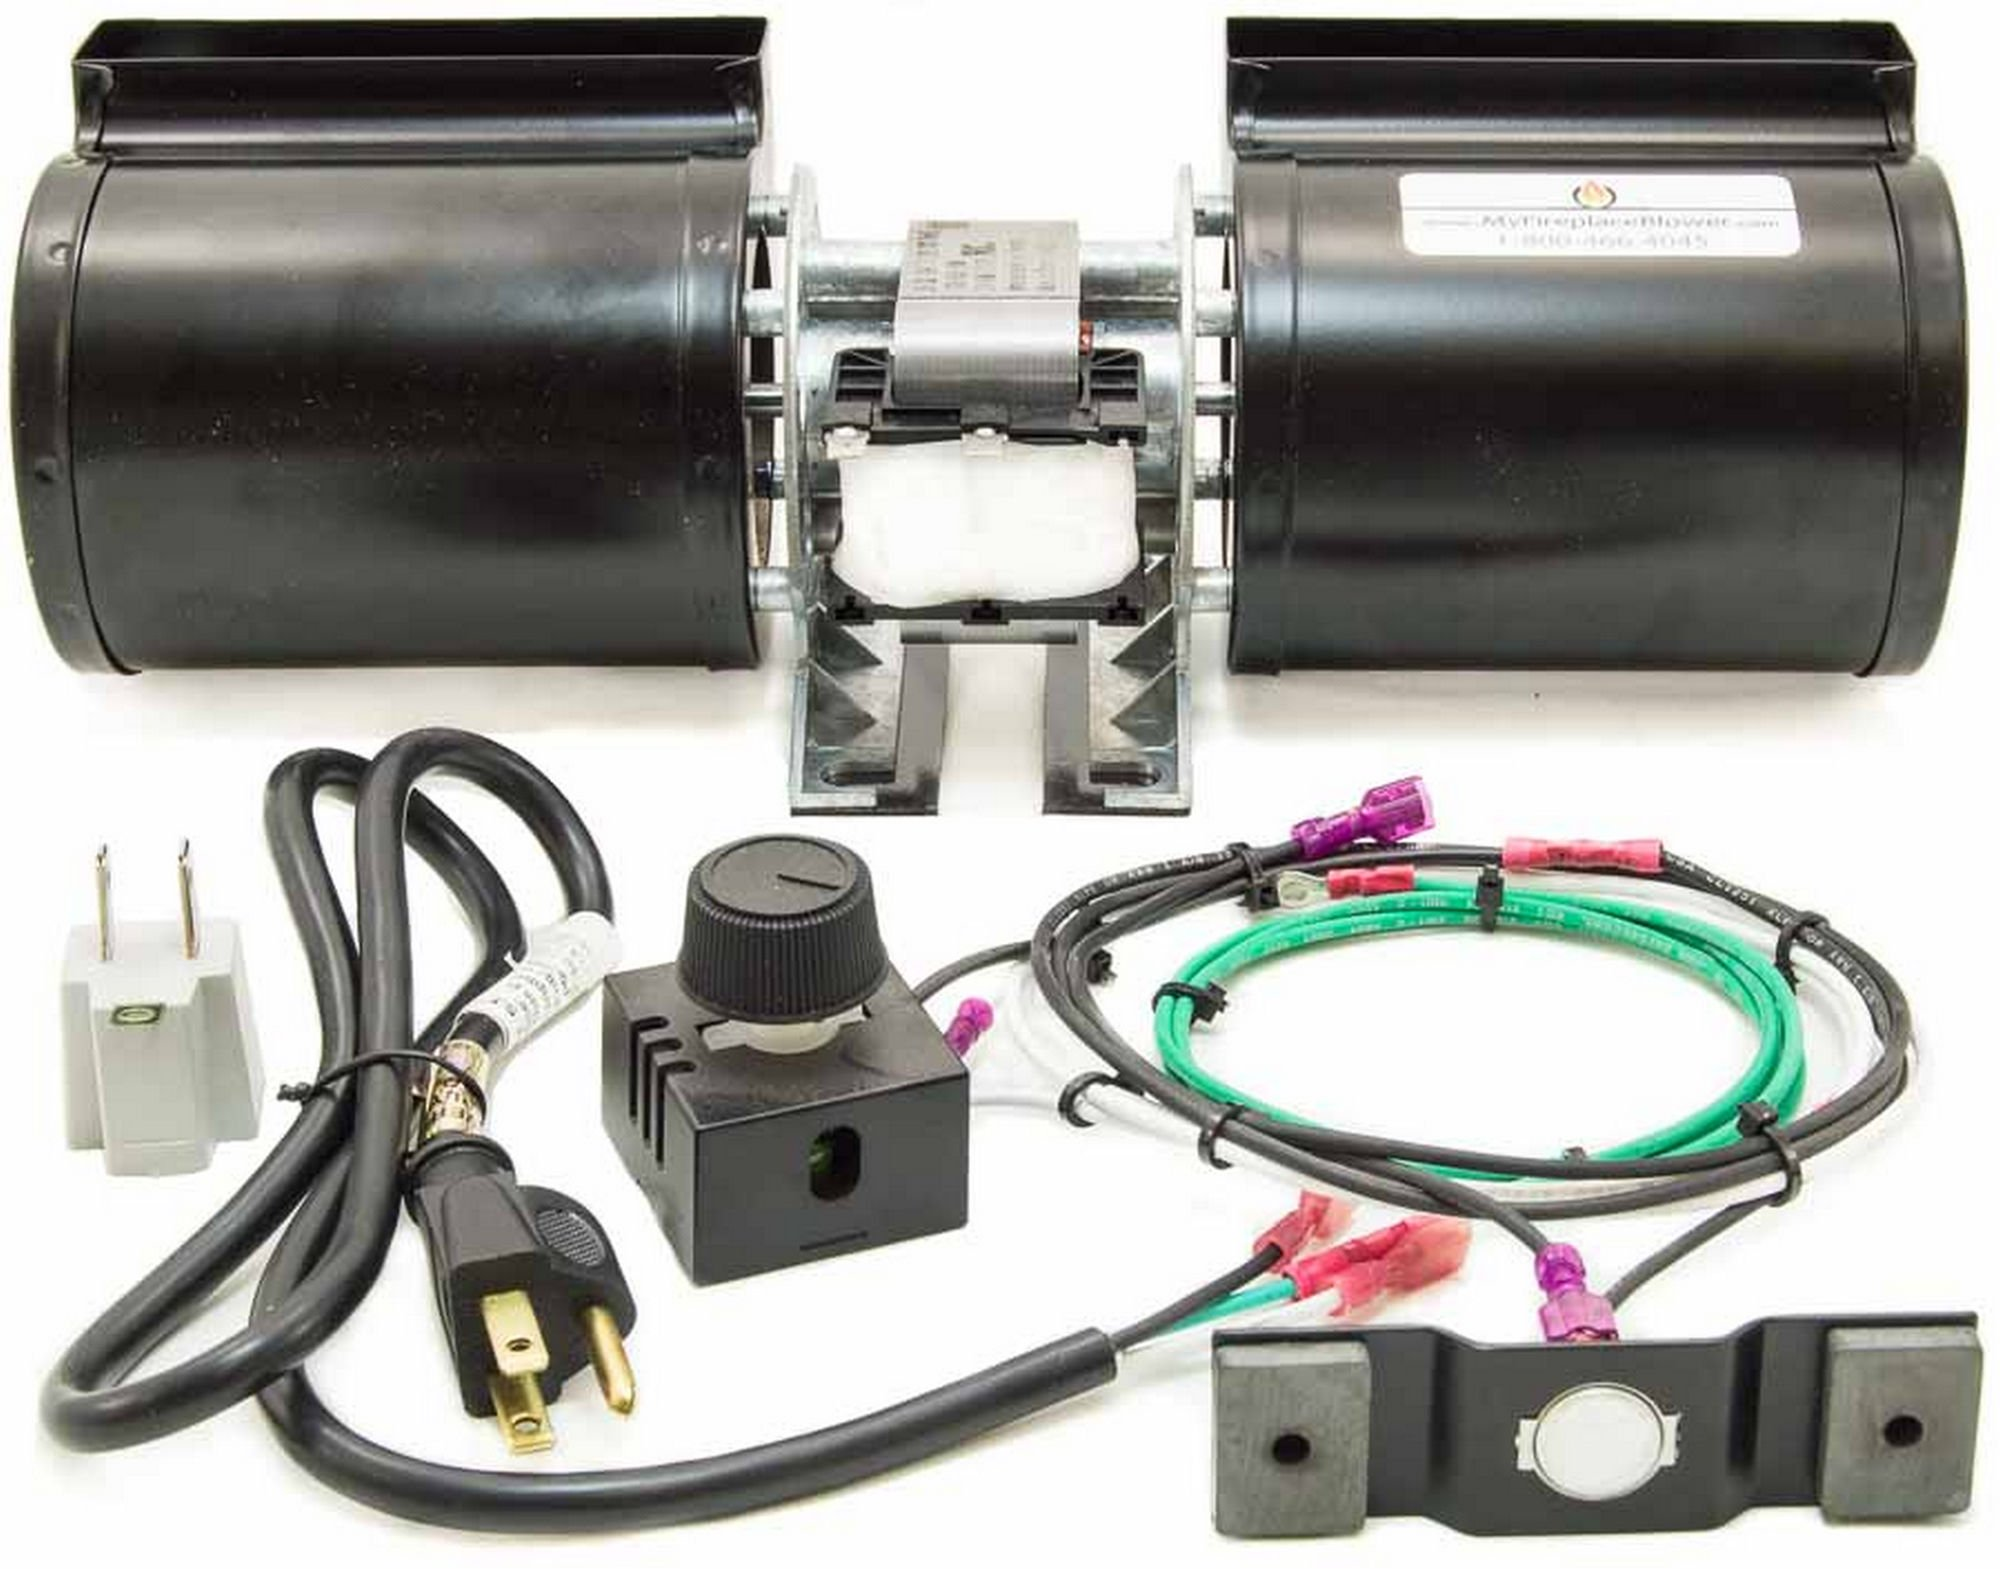 GFK-160A - GFK-160 Fireplace Blower Kit for Heat & GLO - Majestic - Hearth & Home - Quadra-Fire by MyFireplaceBlower